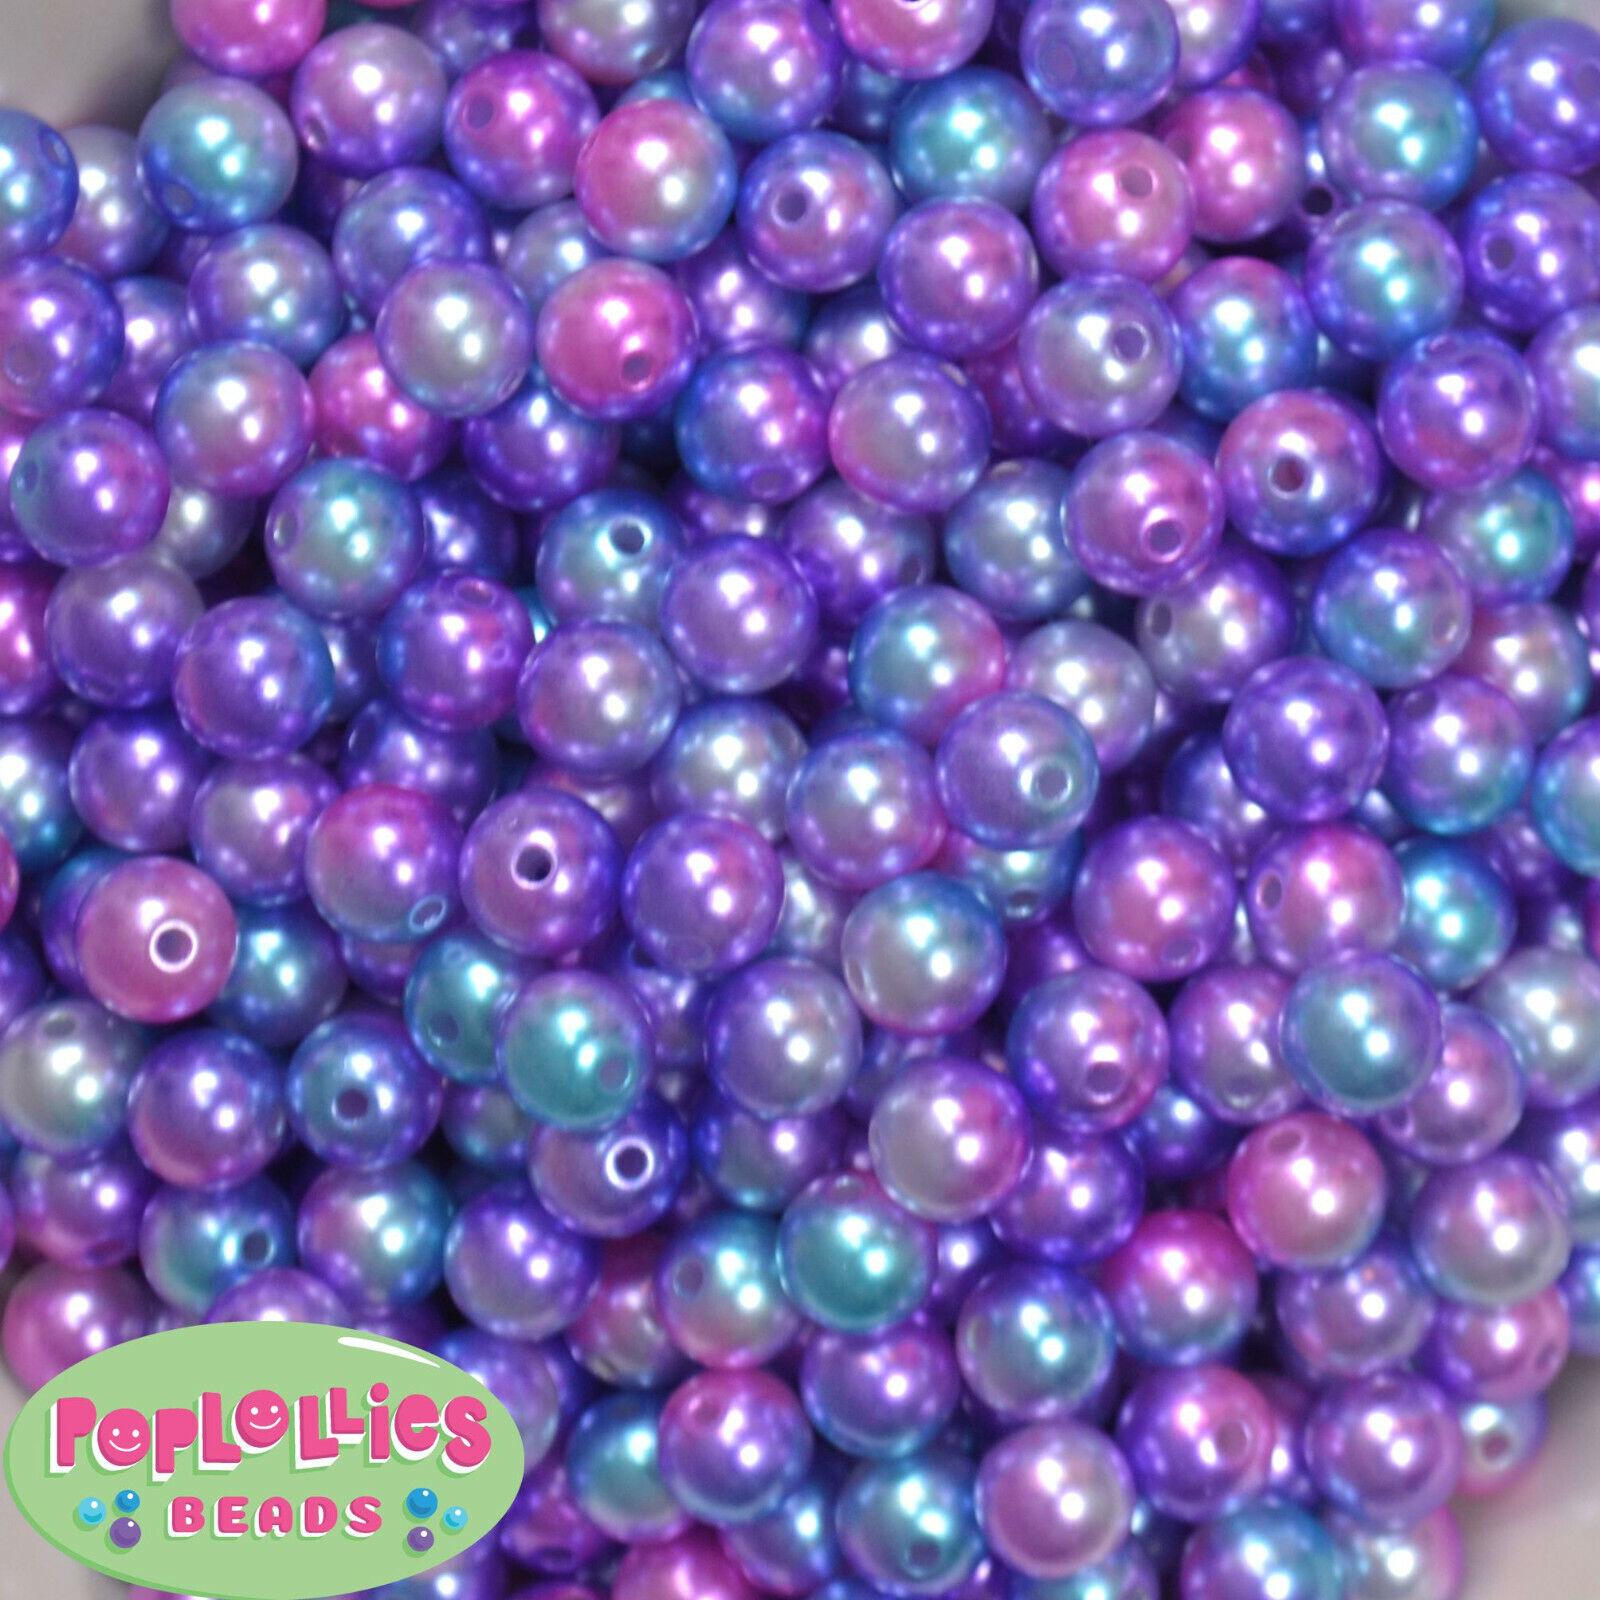 Jewelry Supply Acrylic Bubblegum Beads Chunky Beads Supply  Beads Gumball Beads OVERSTOCK SALE 12mm Aqua Bubblegum Beads